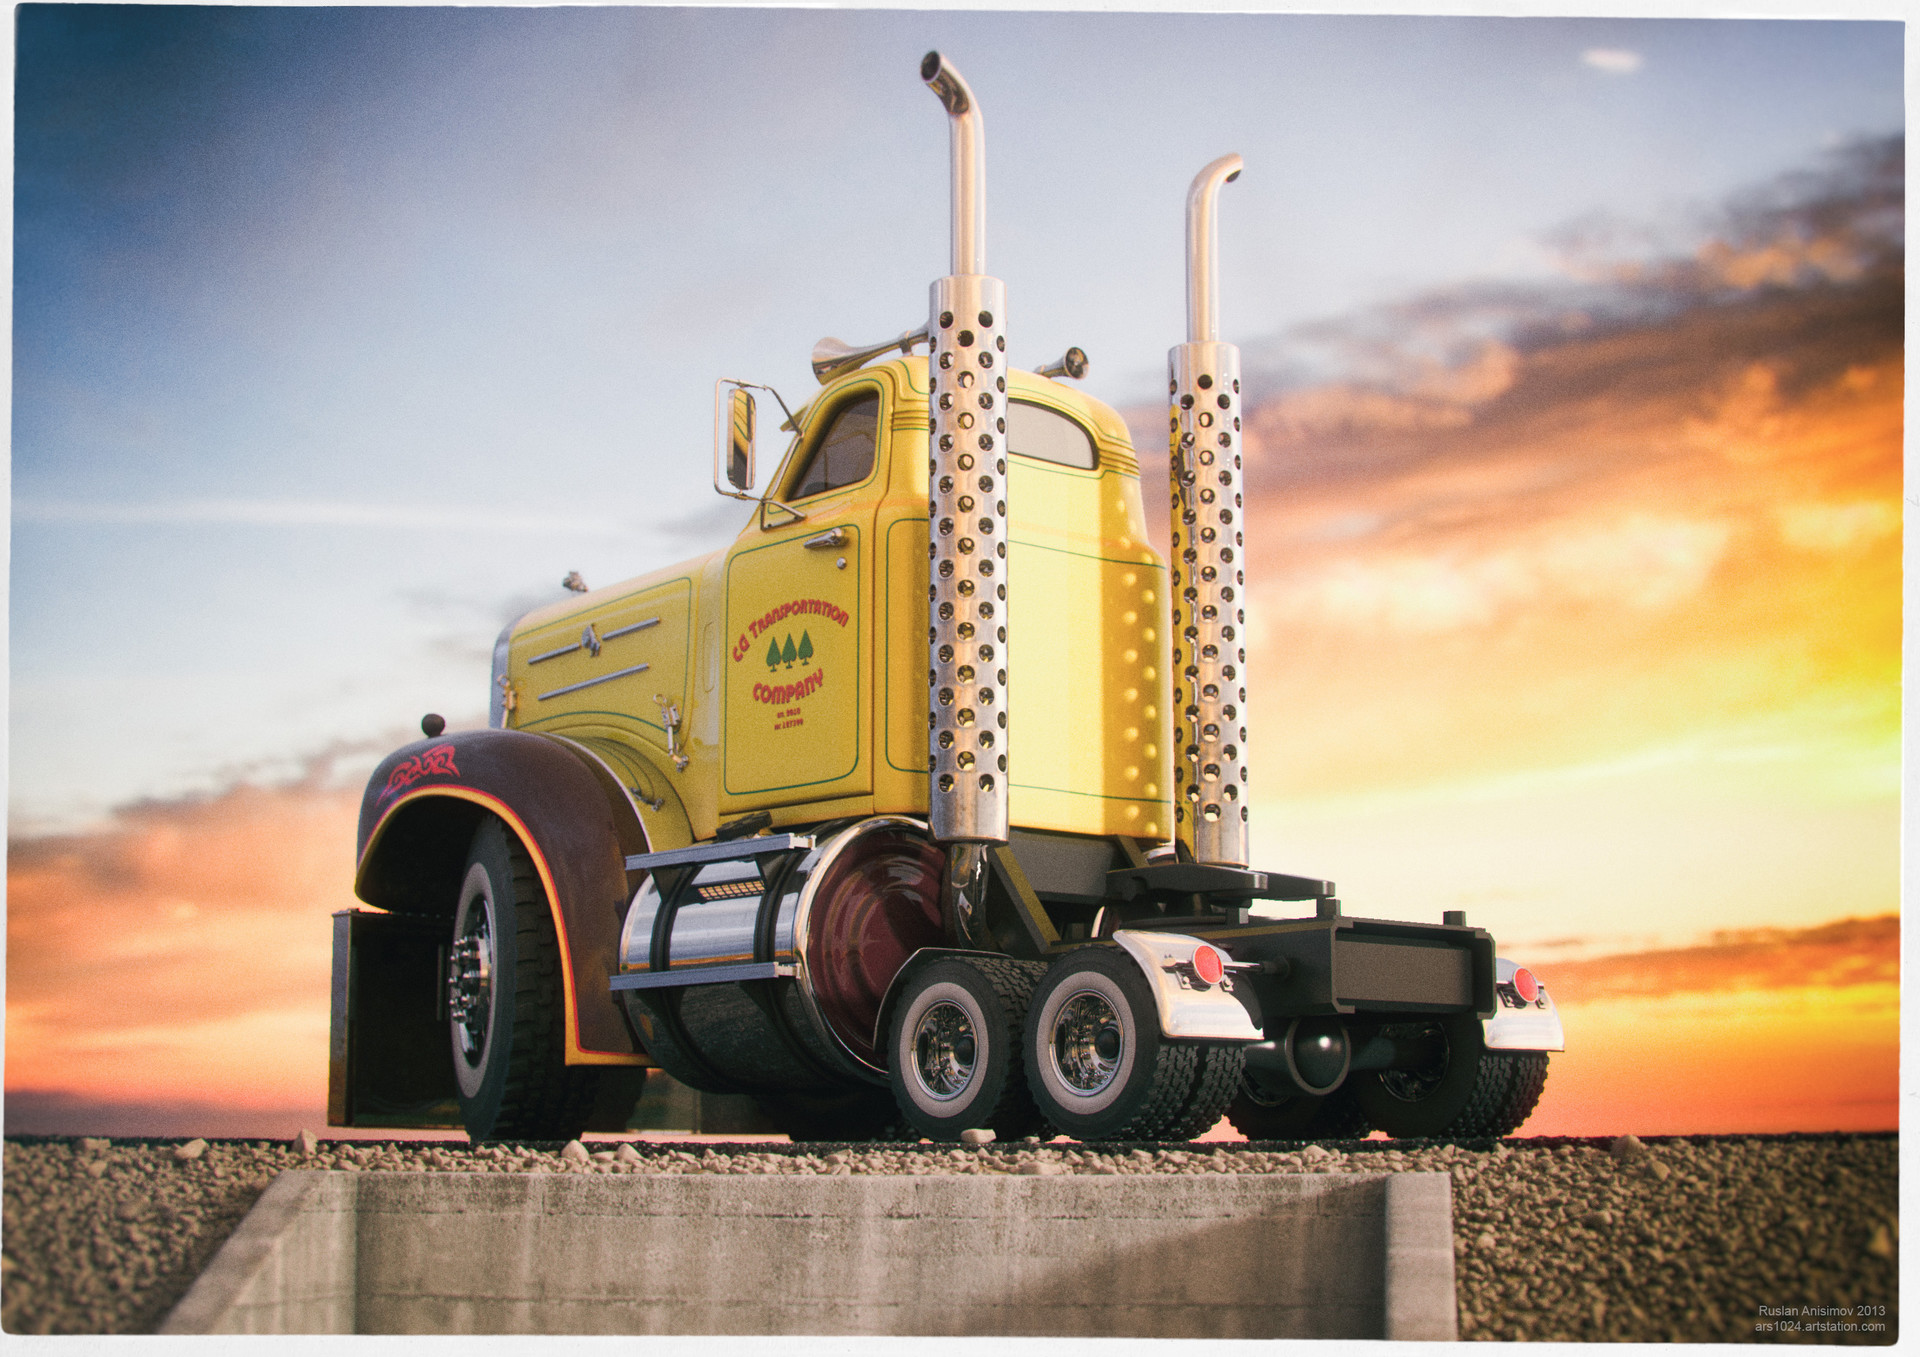 Ruslan anisimov 2013 truck05